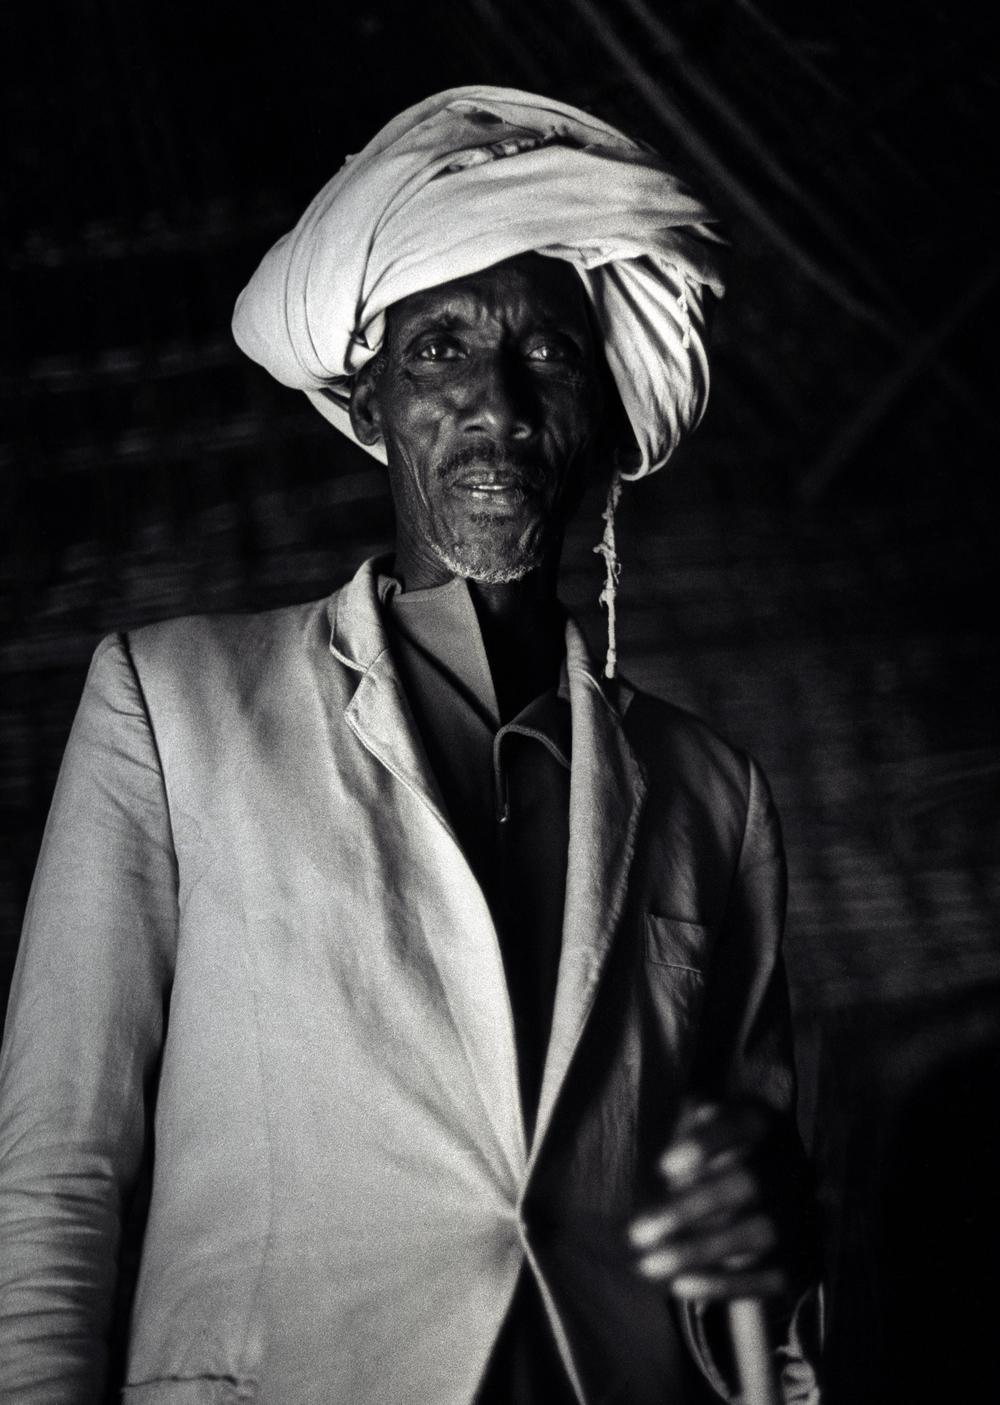 Gabbra elder, Sololo, Kenya